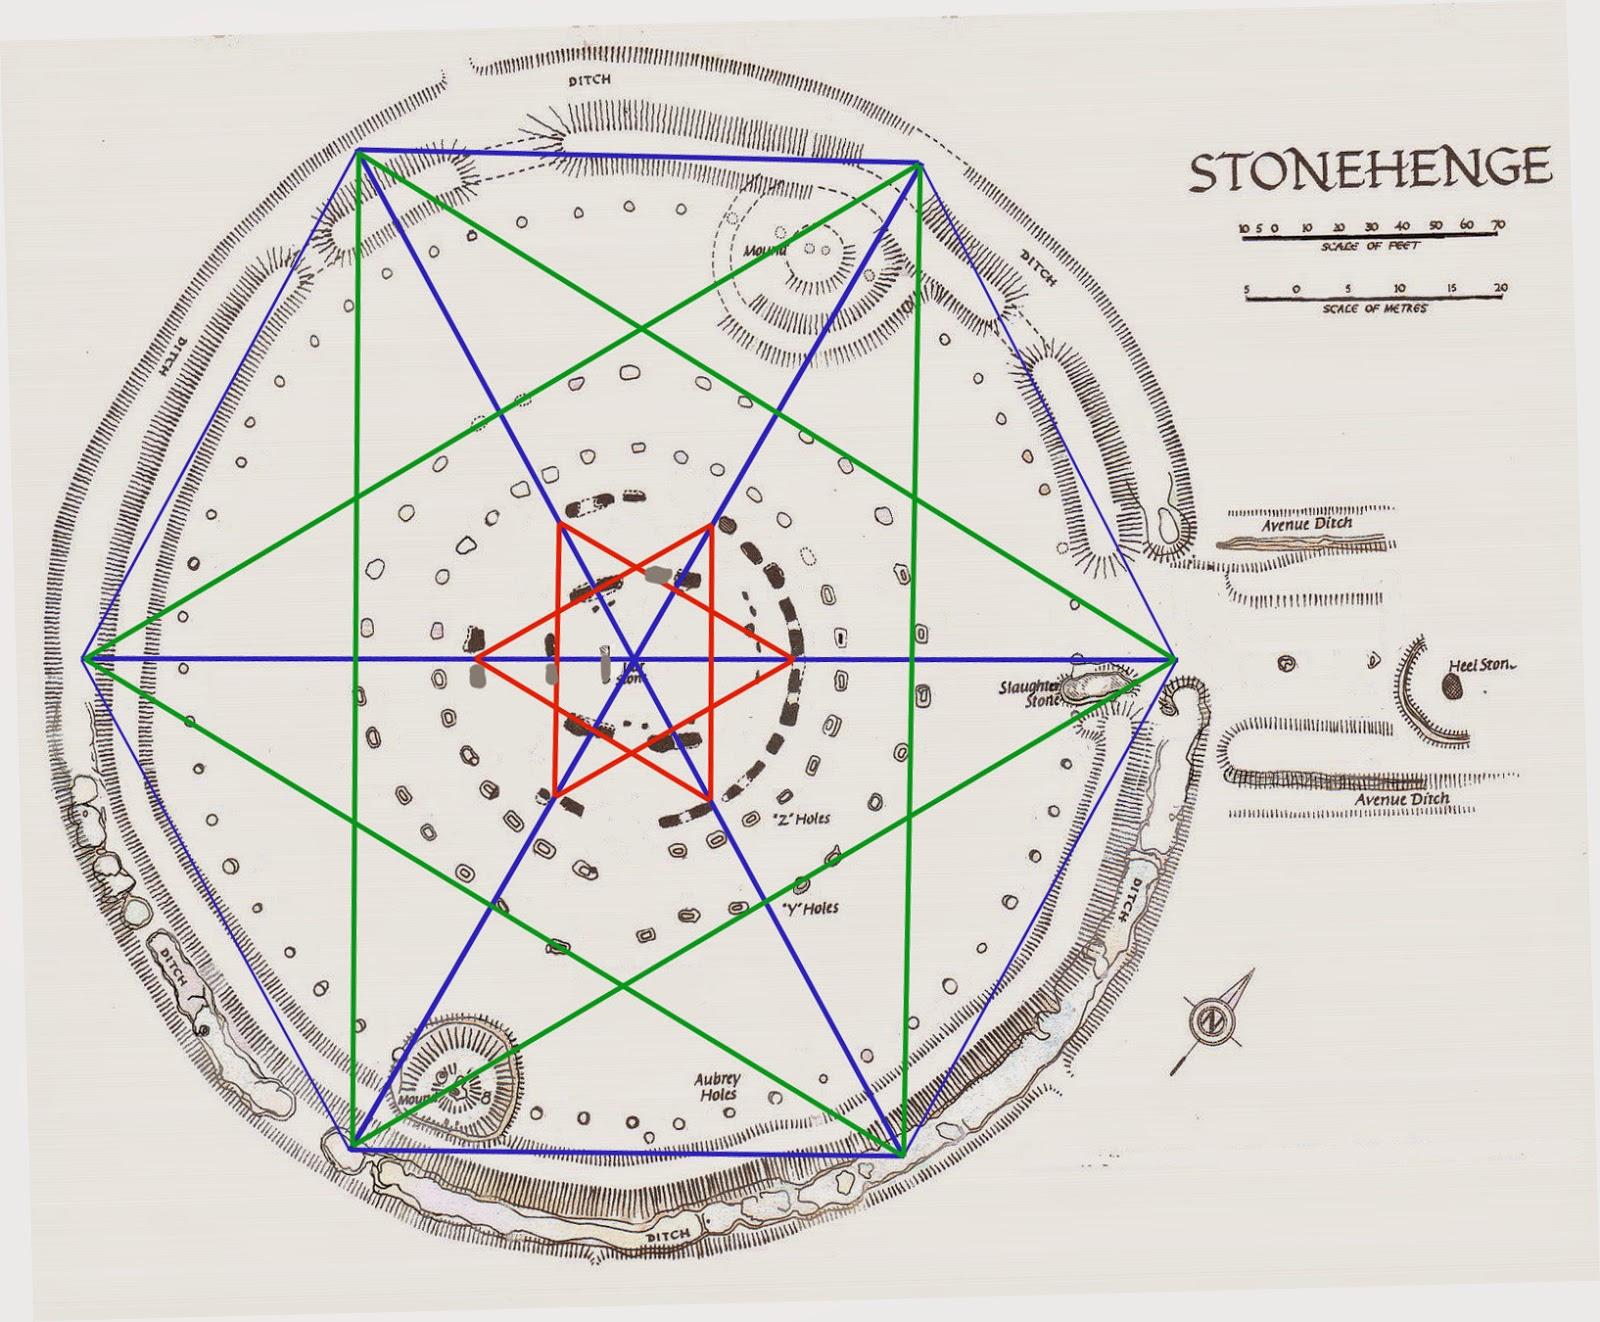 How was Stonehenge Built How was Stonehenge Built